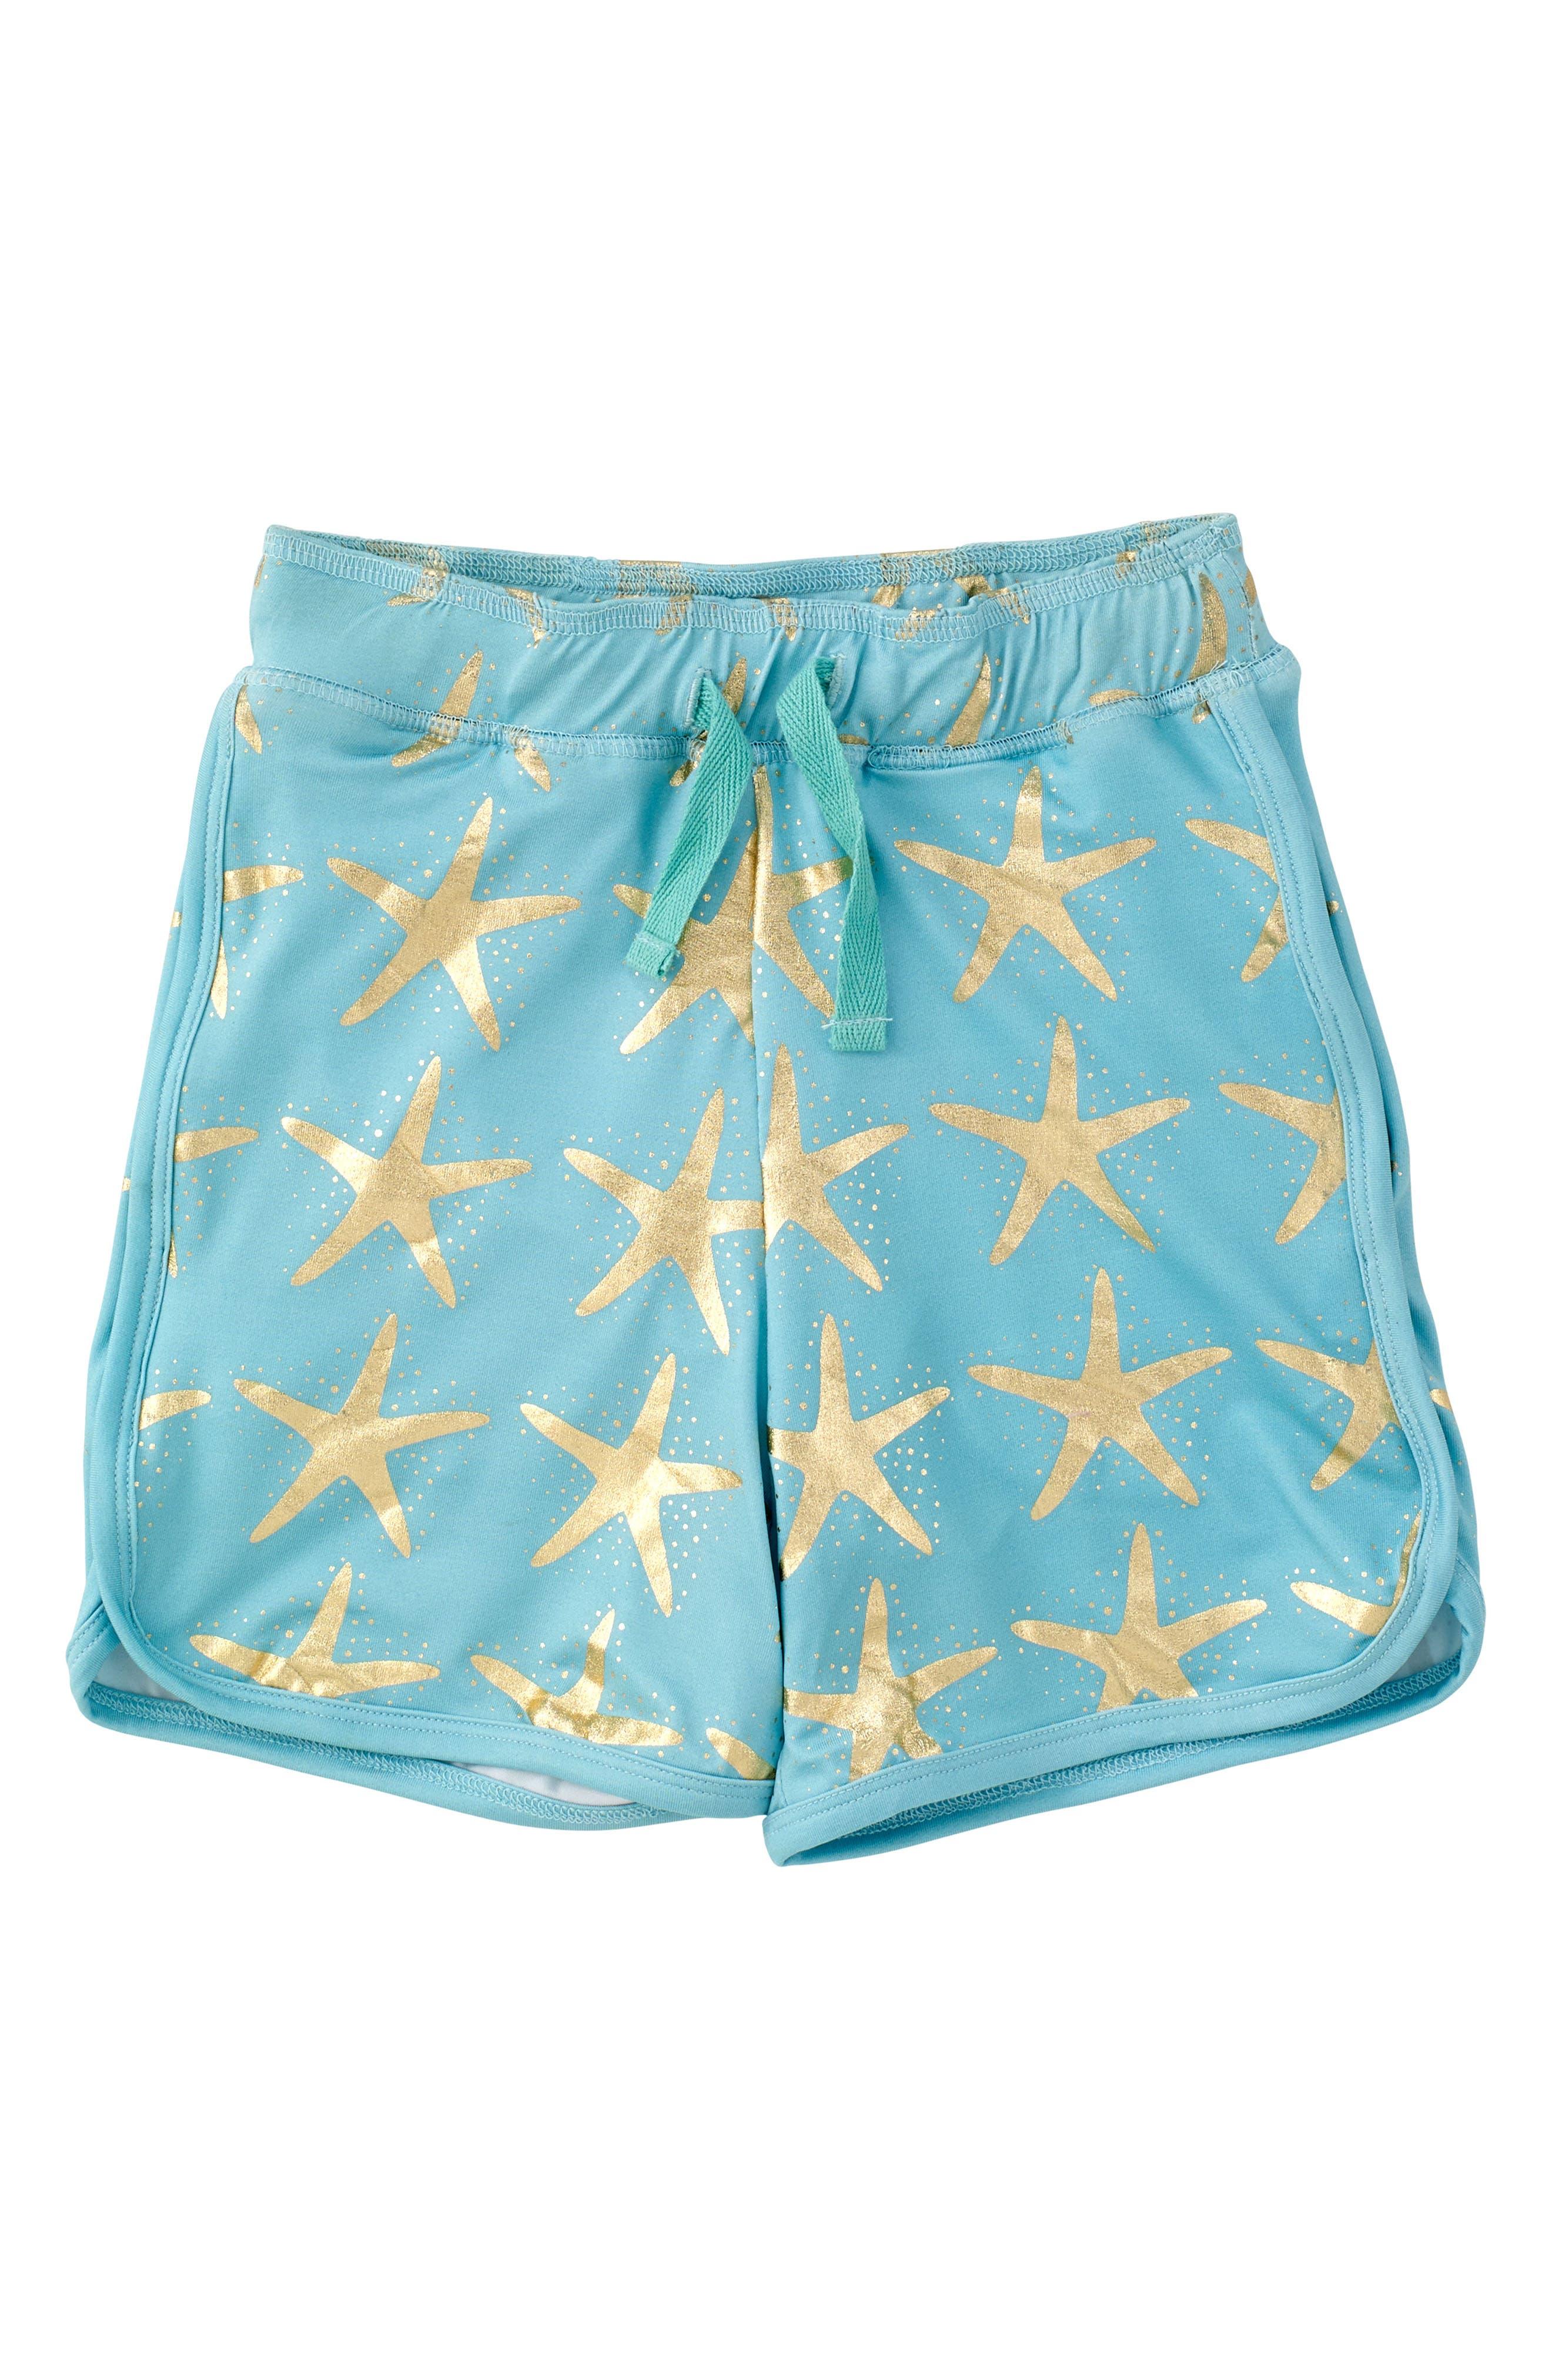 Starfish Swim Trunks,                             Main thumbnail 1, color,                             400